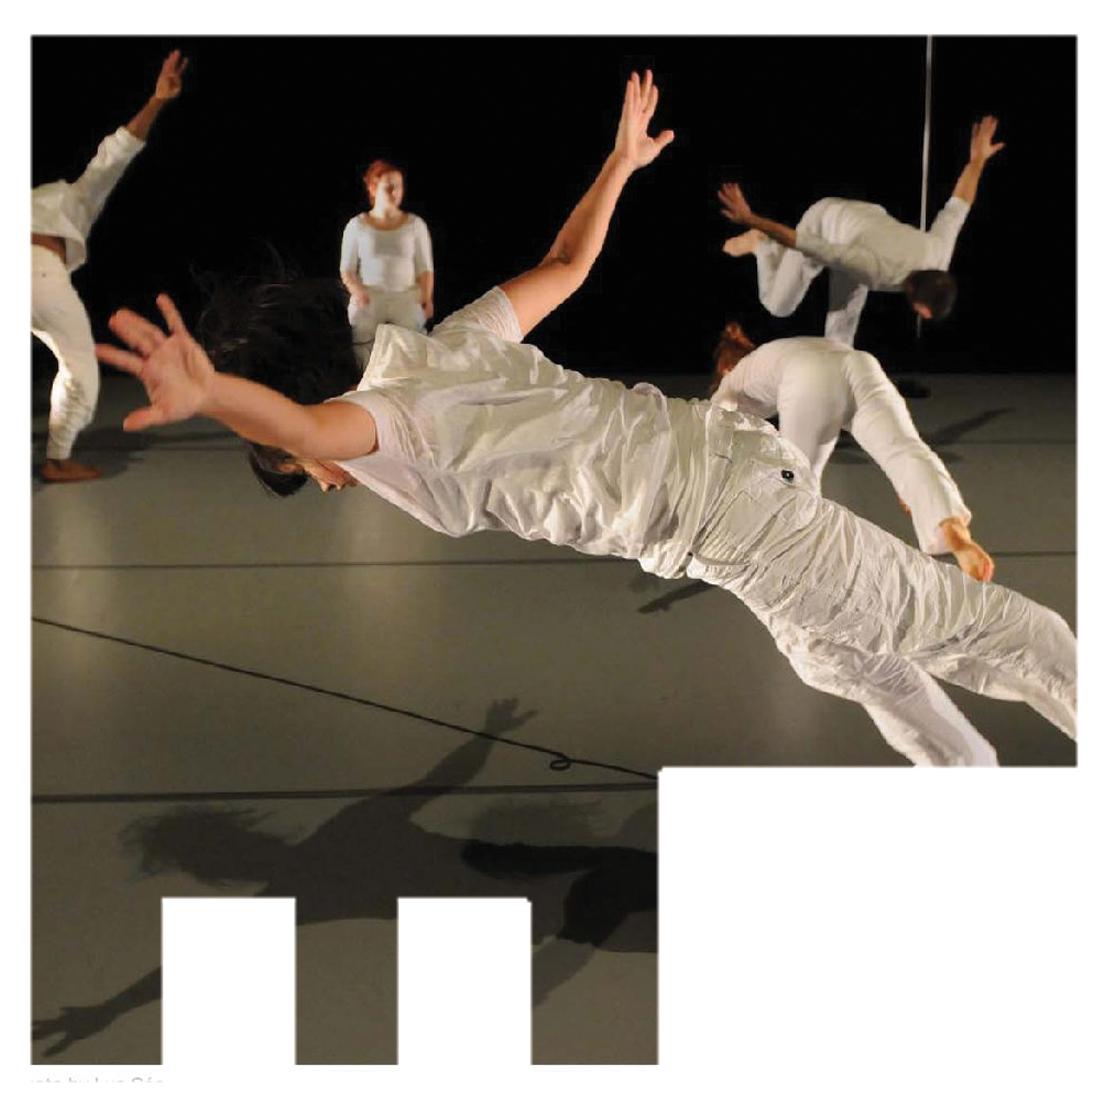 Danse Carpe Diem  in the photo.